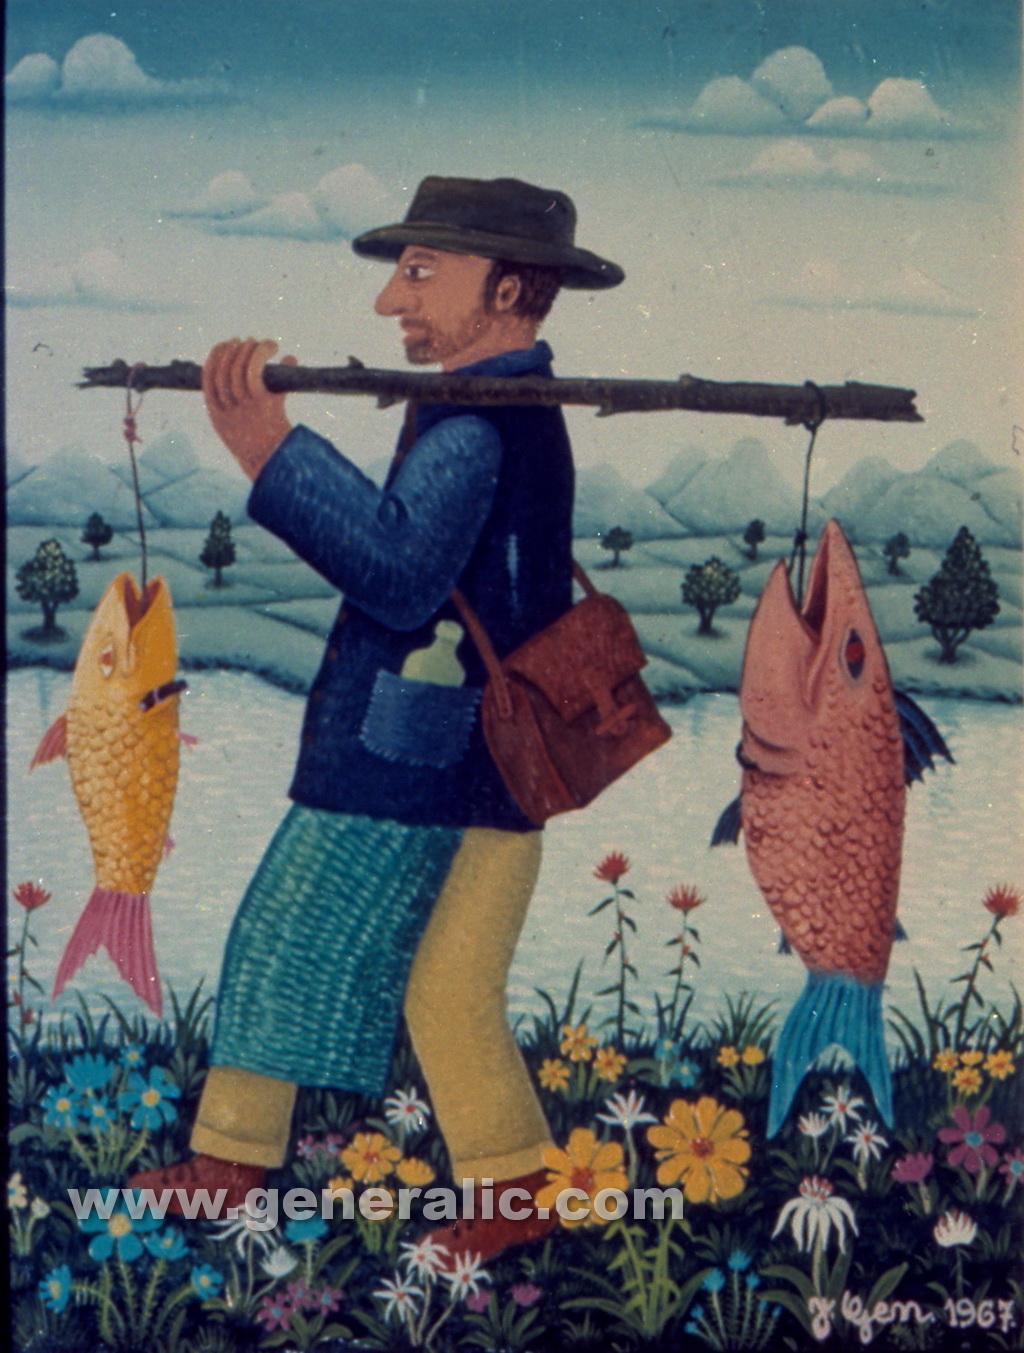 Josip Generalic, 1967, Fisherman, oil on canvas